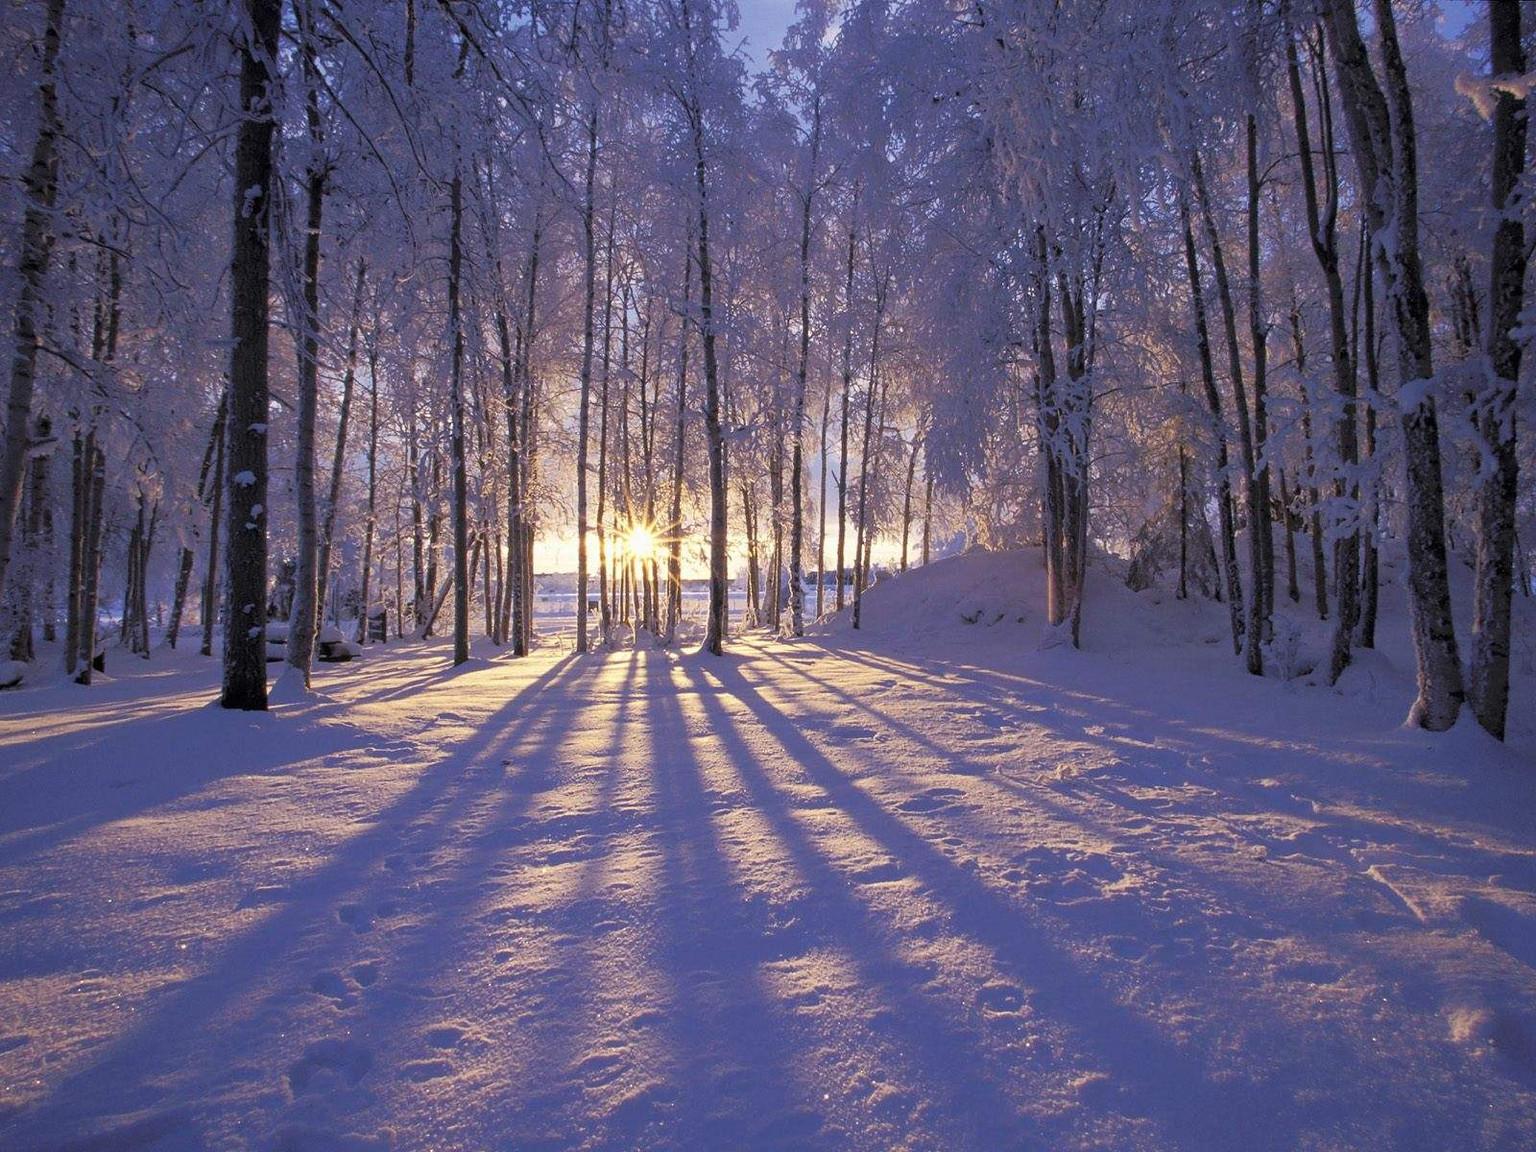 ws_Winter_Sunset_II_1600x1200.jpg